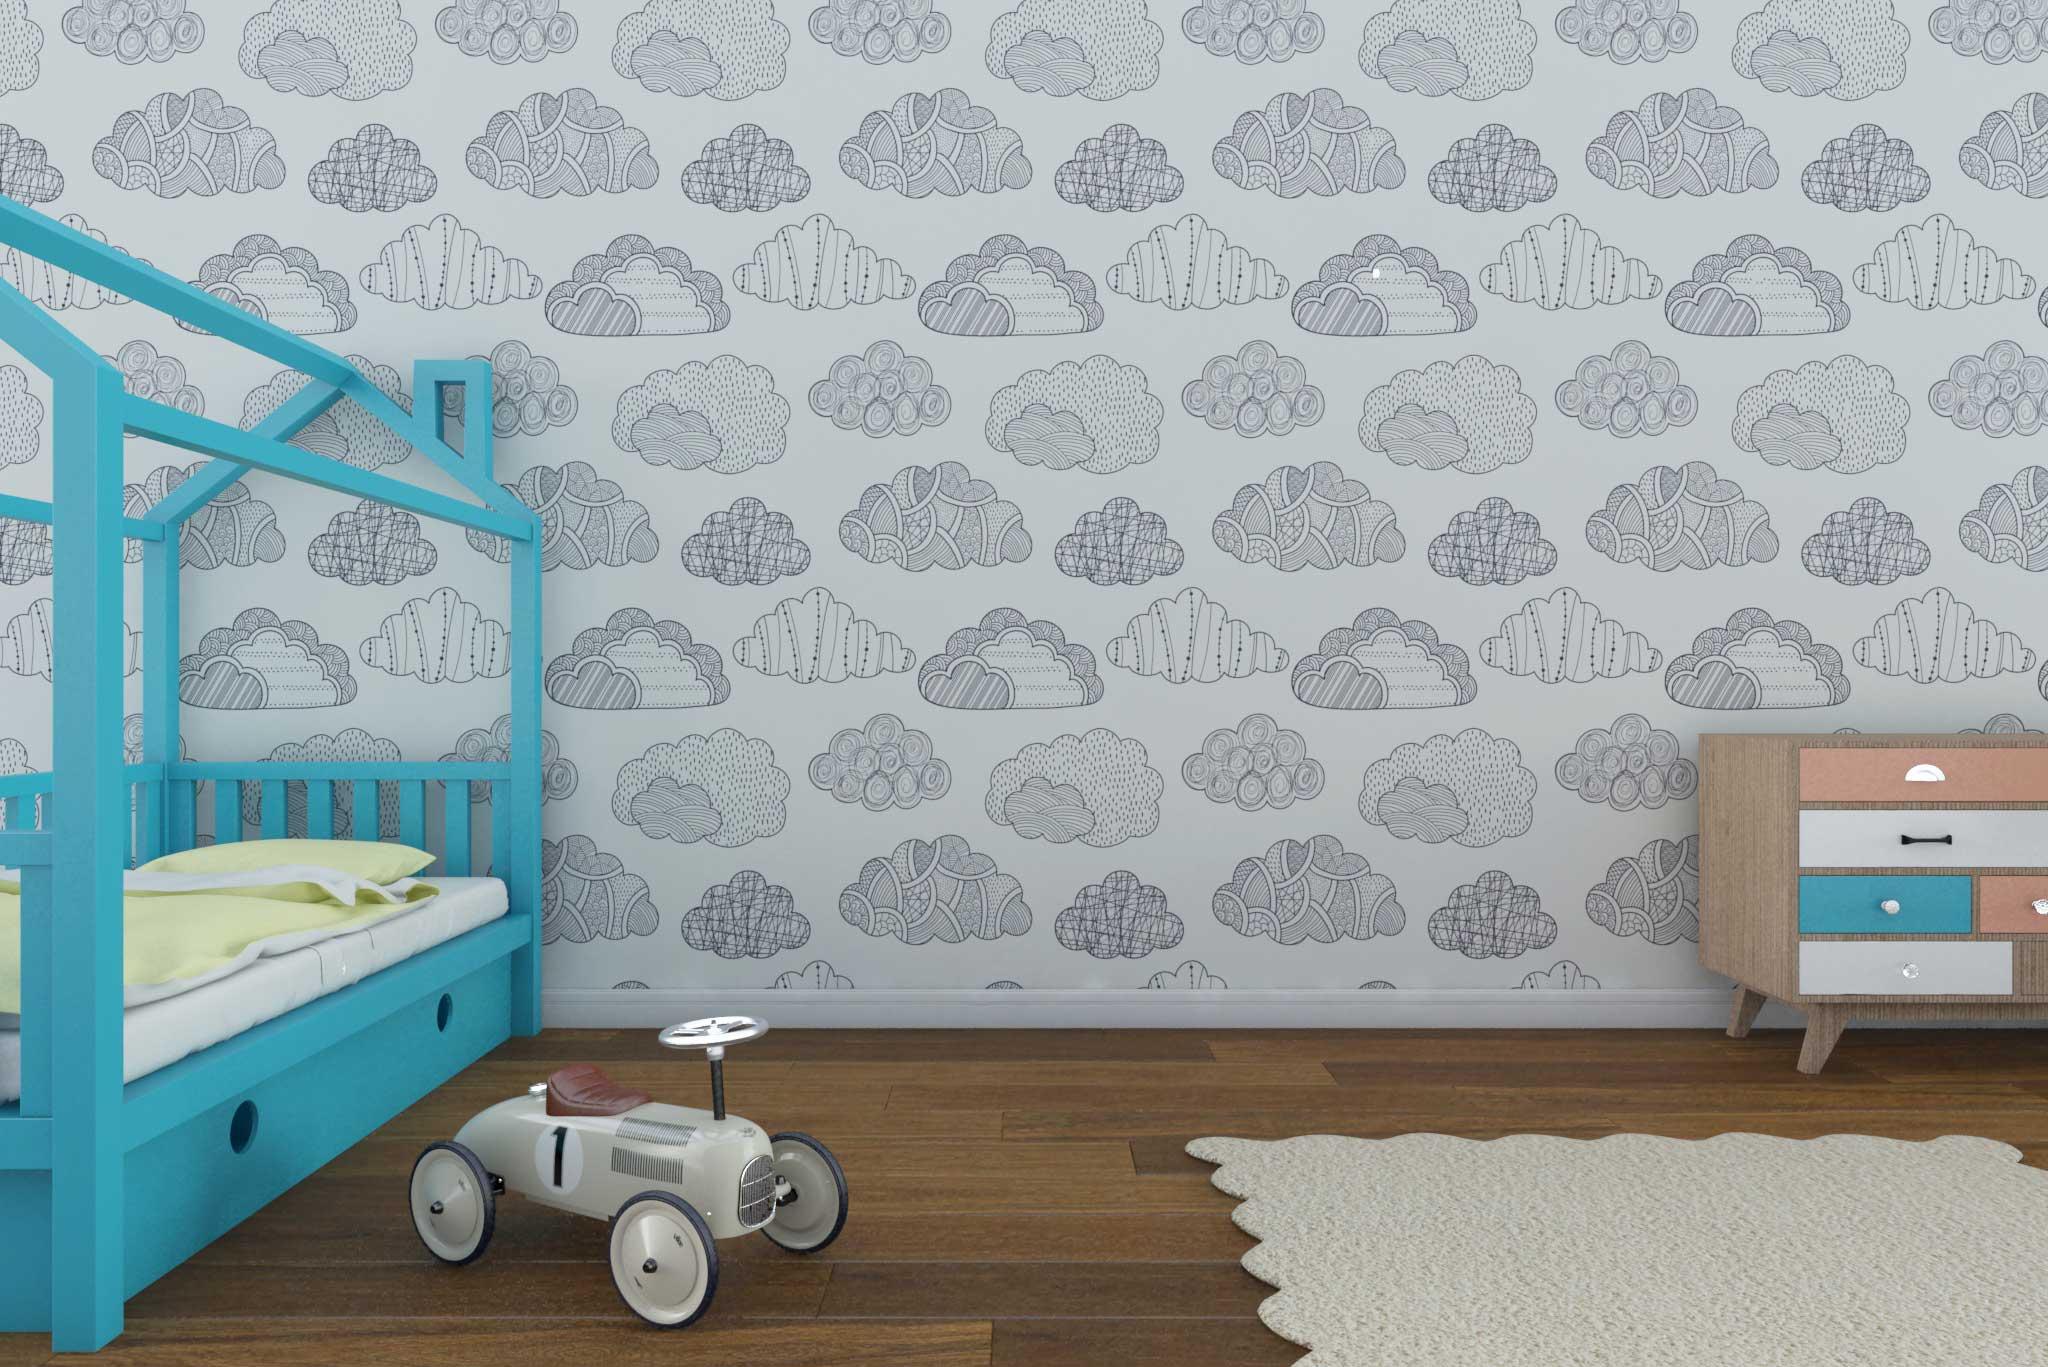 tapet-fototapet-comanda-personalizat-bucuresti-camera-dormitor-copii-model-nori-ilustratie-alb-negru